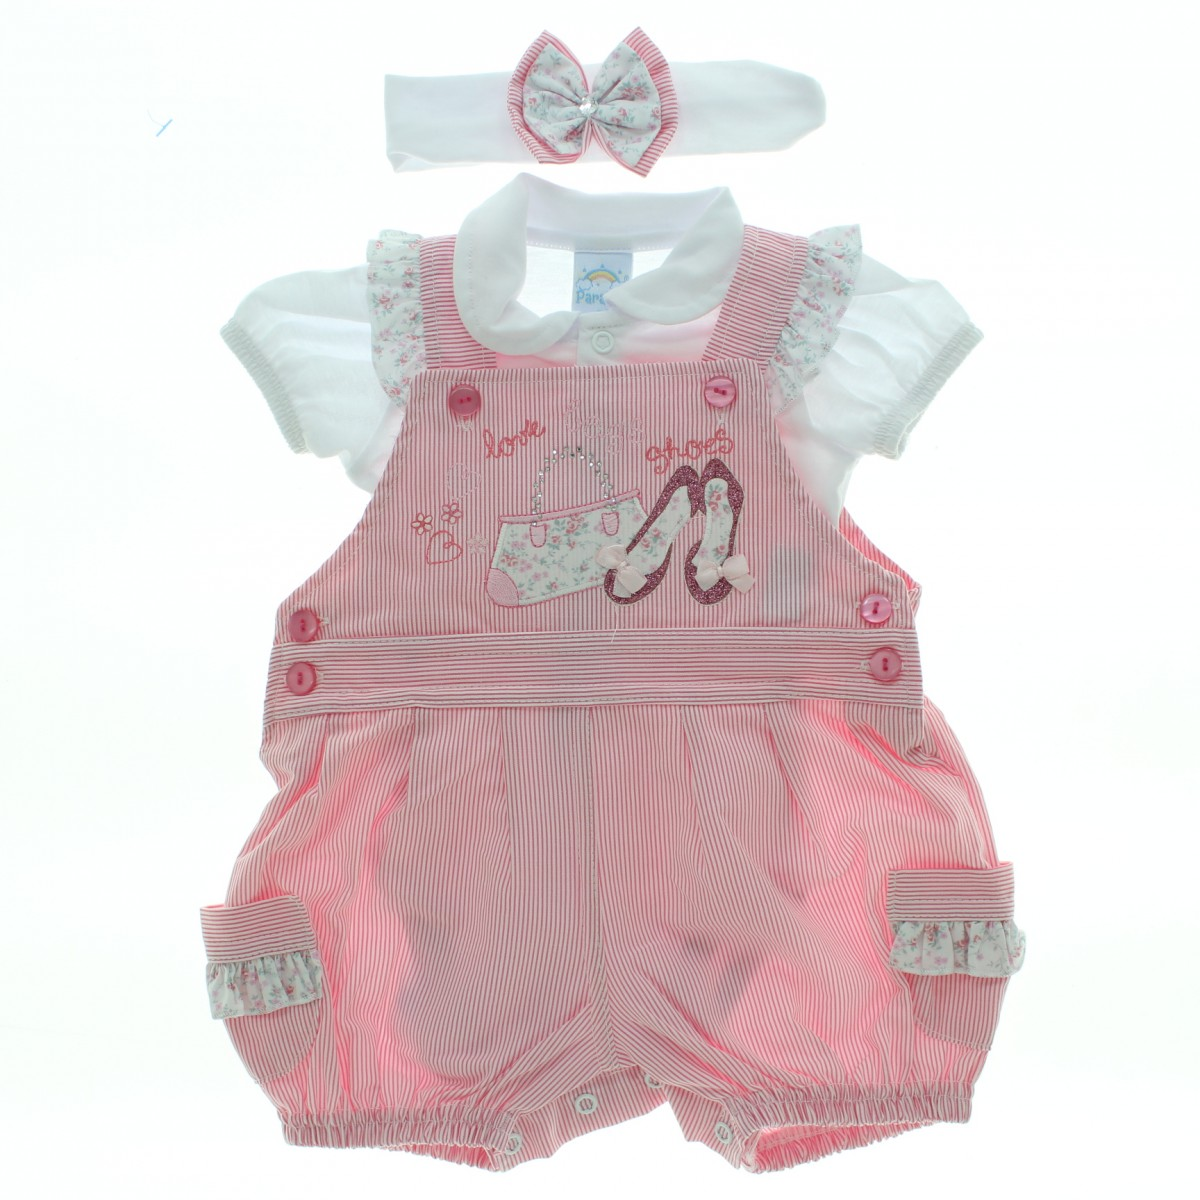 Compre macac o curto paraiso beb menina jardineira body for Jardineira bebe 1 ano